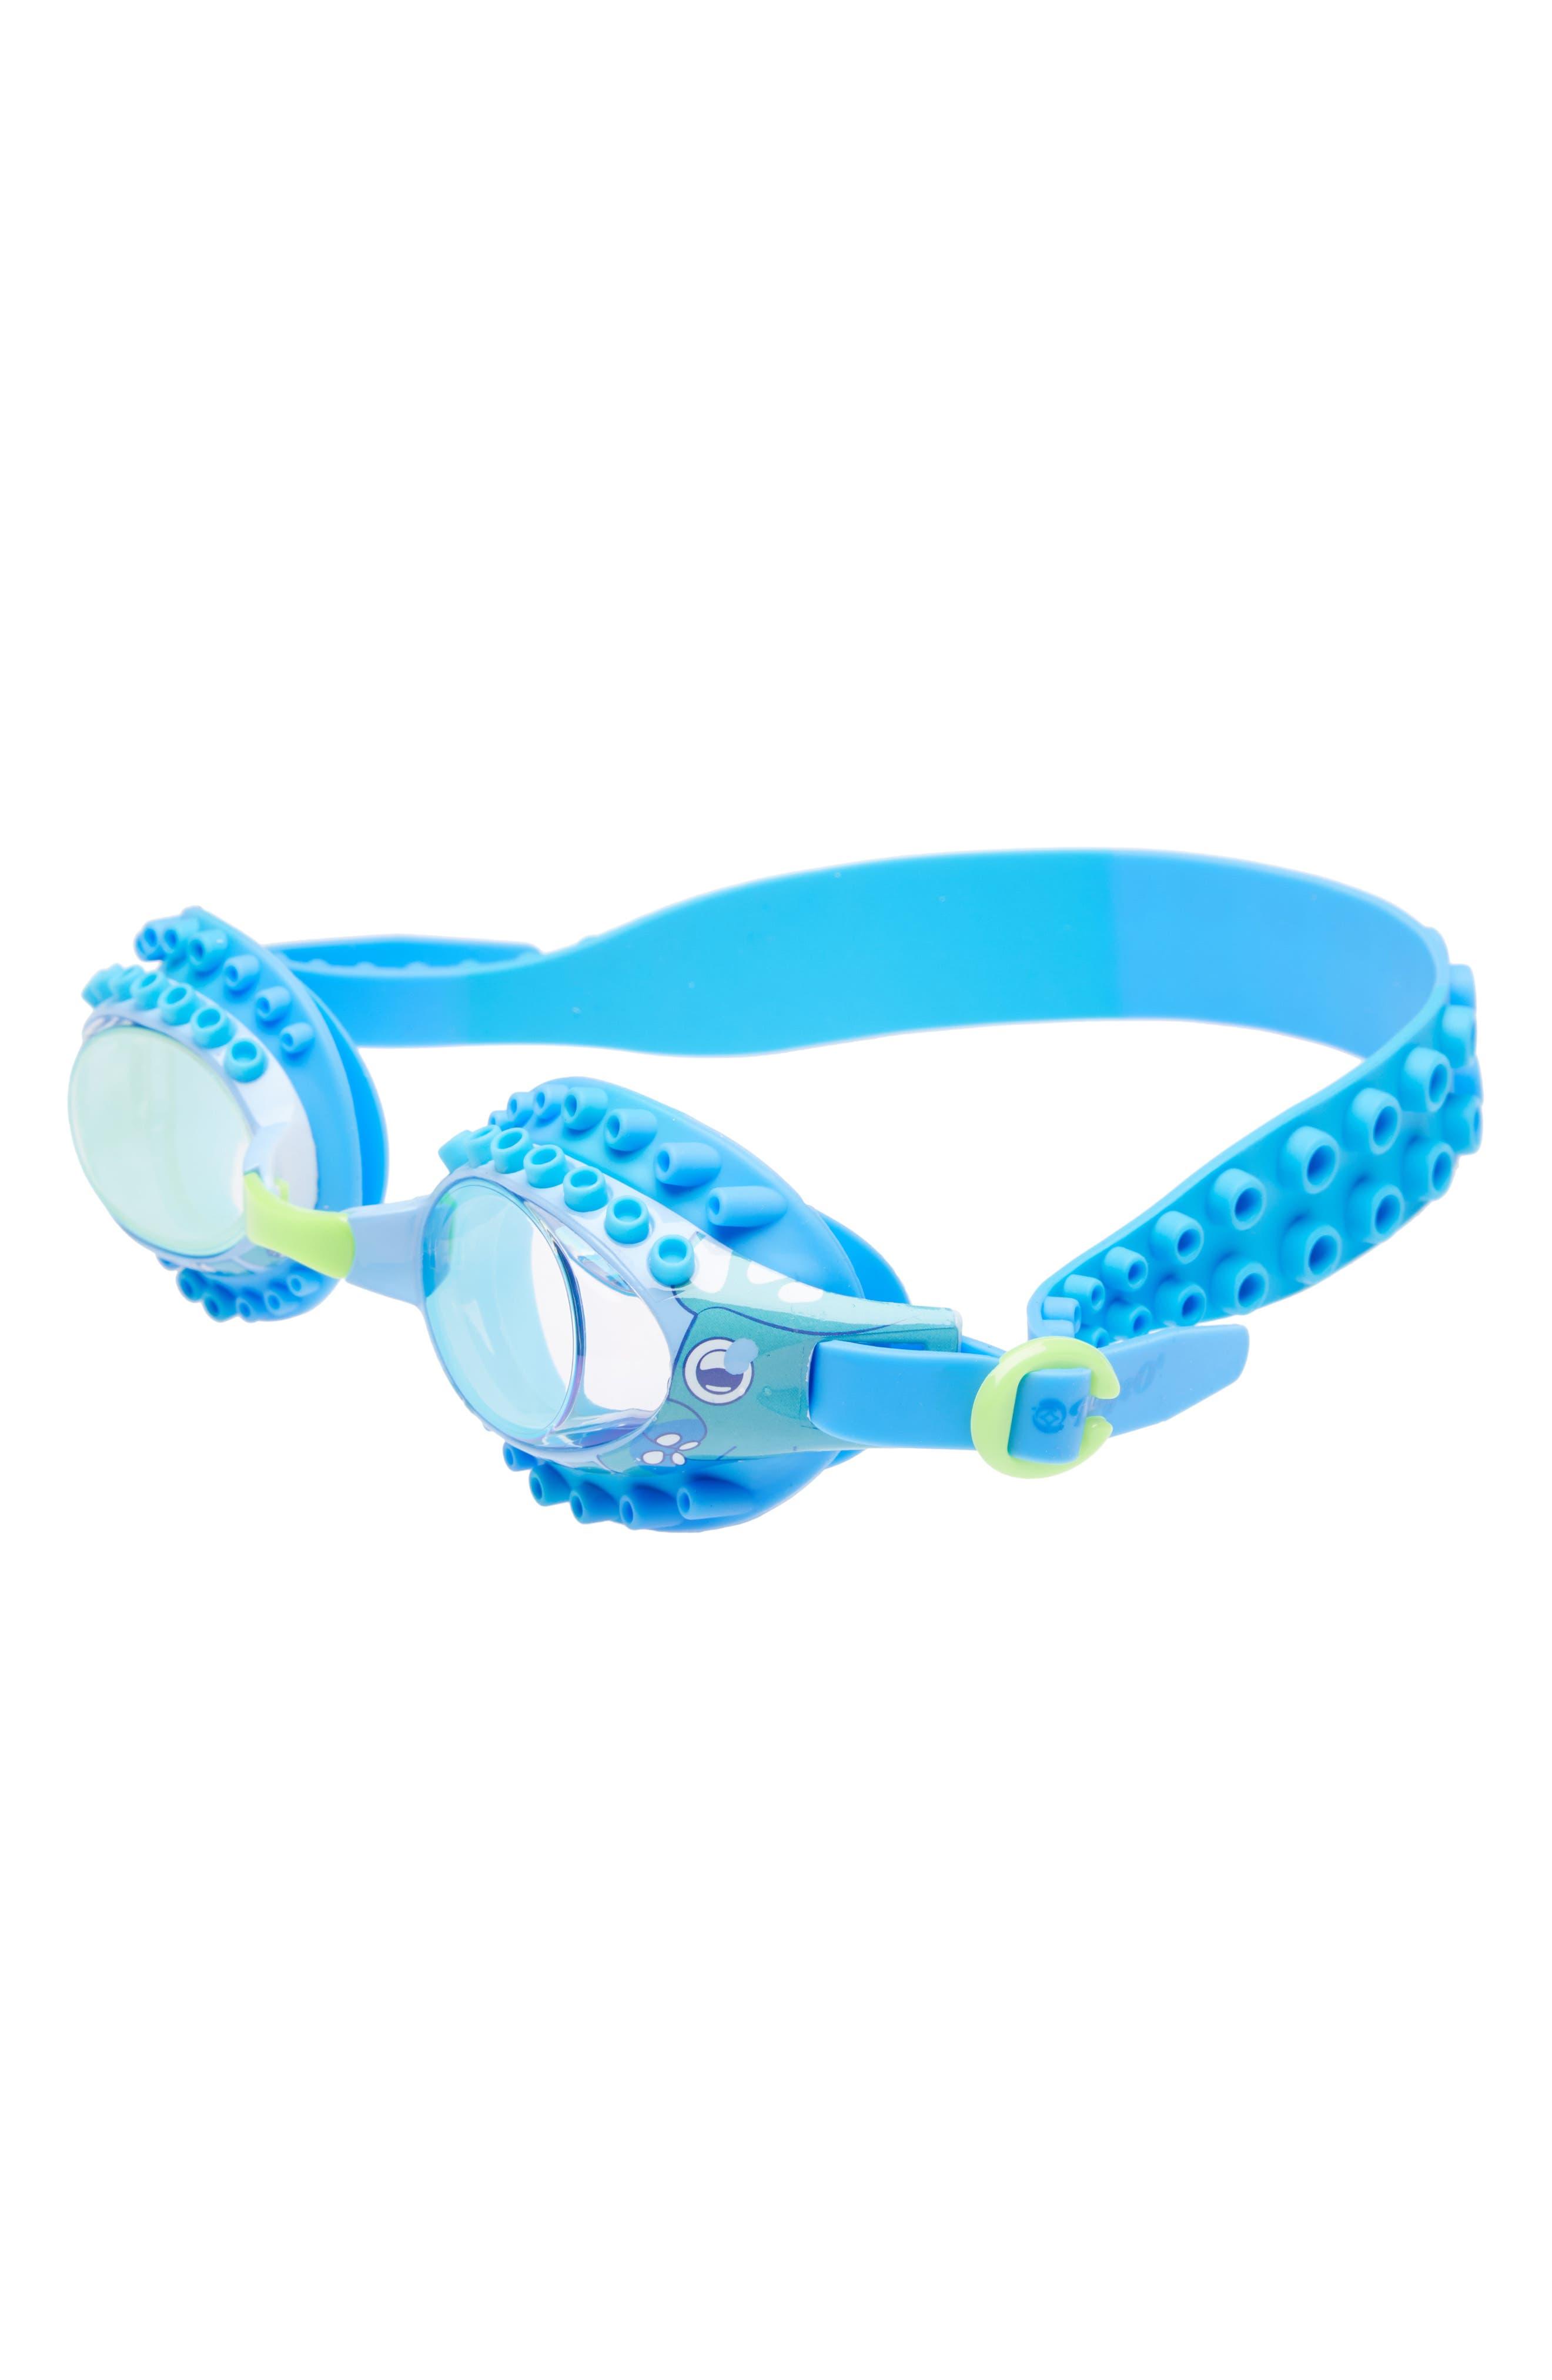 Octopus Swim Goggles,                         Main,                         color, Blue